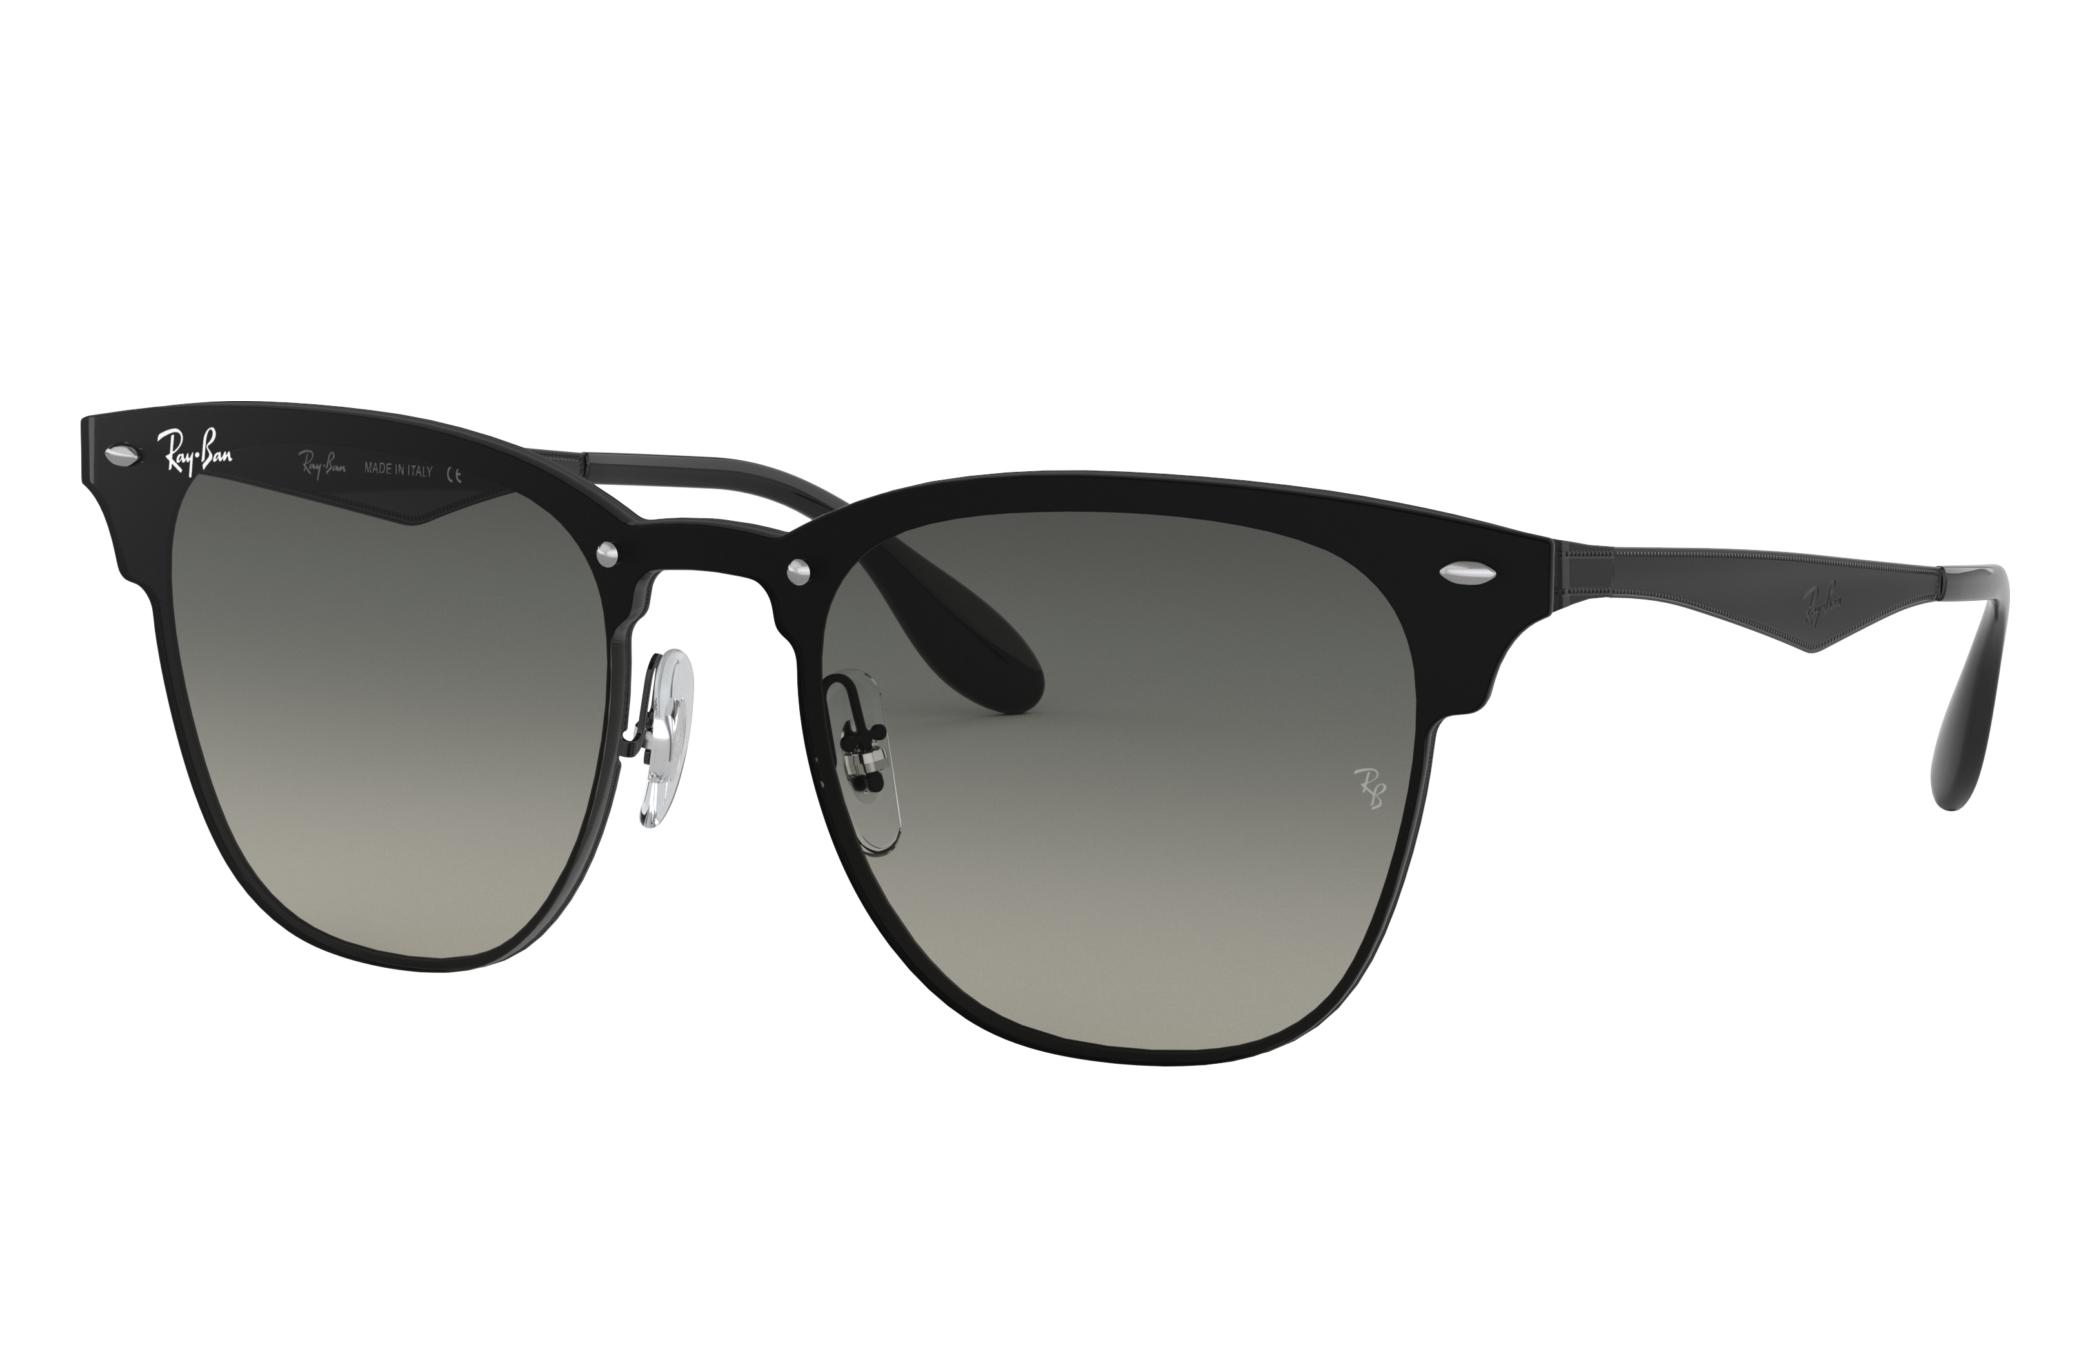 Ray-Ban Blaze Clubmaster Black, Gray Lenses - RB3576N